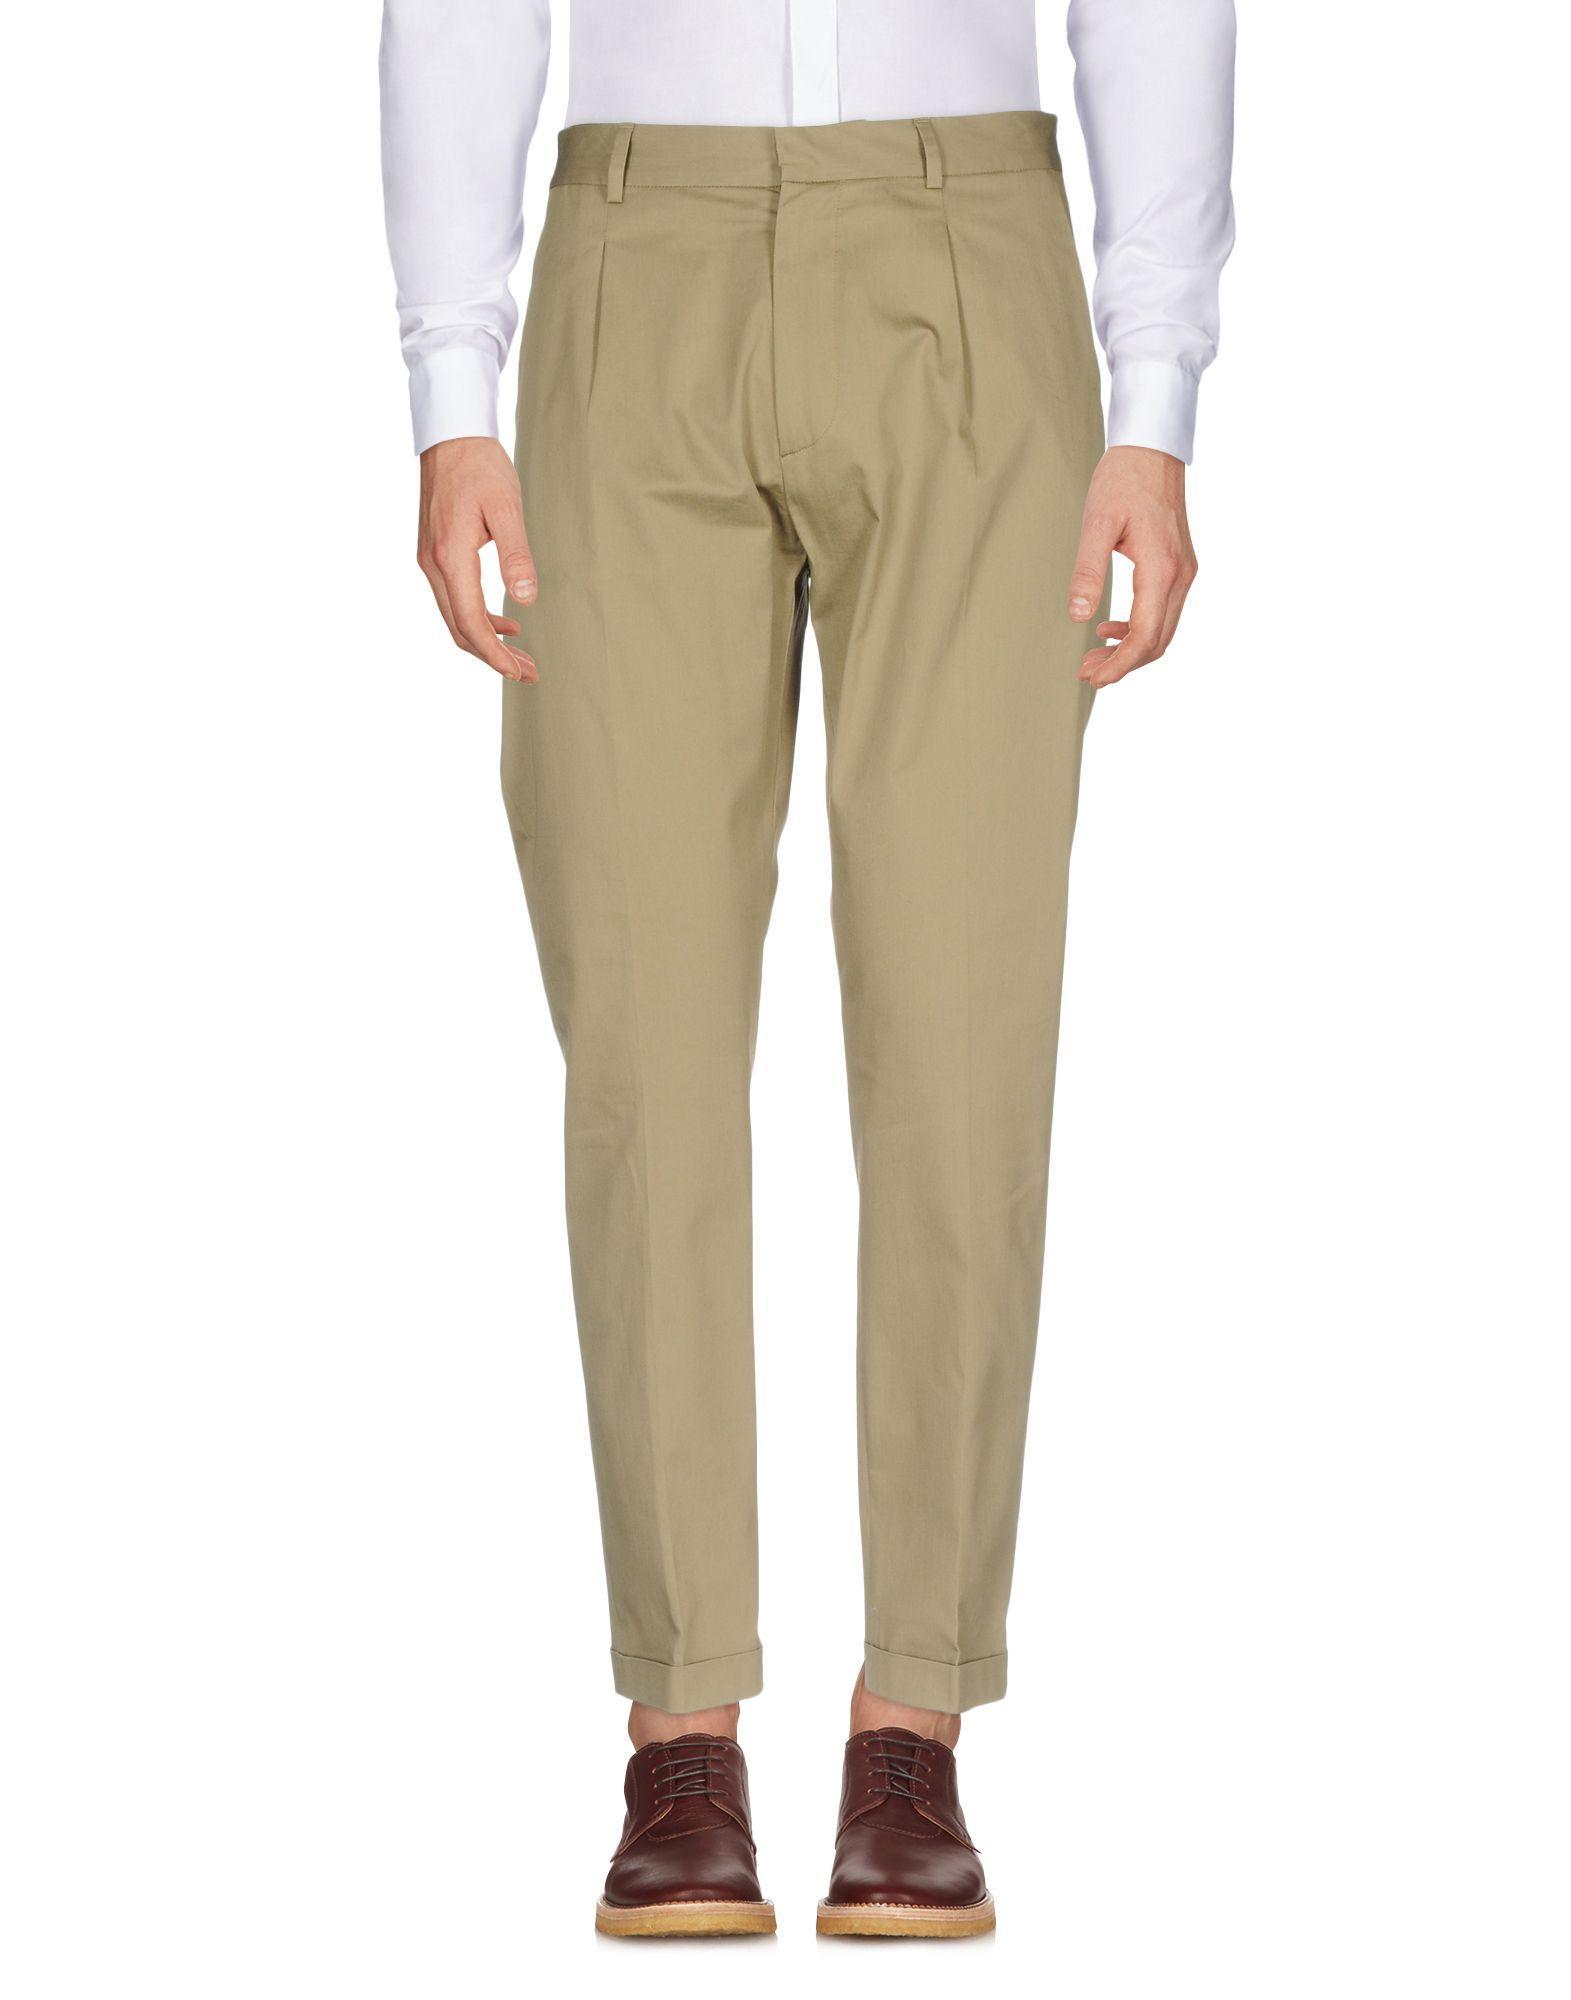 Low Brand Casual Pants In Khaki